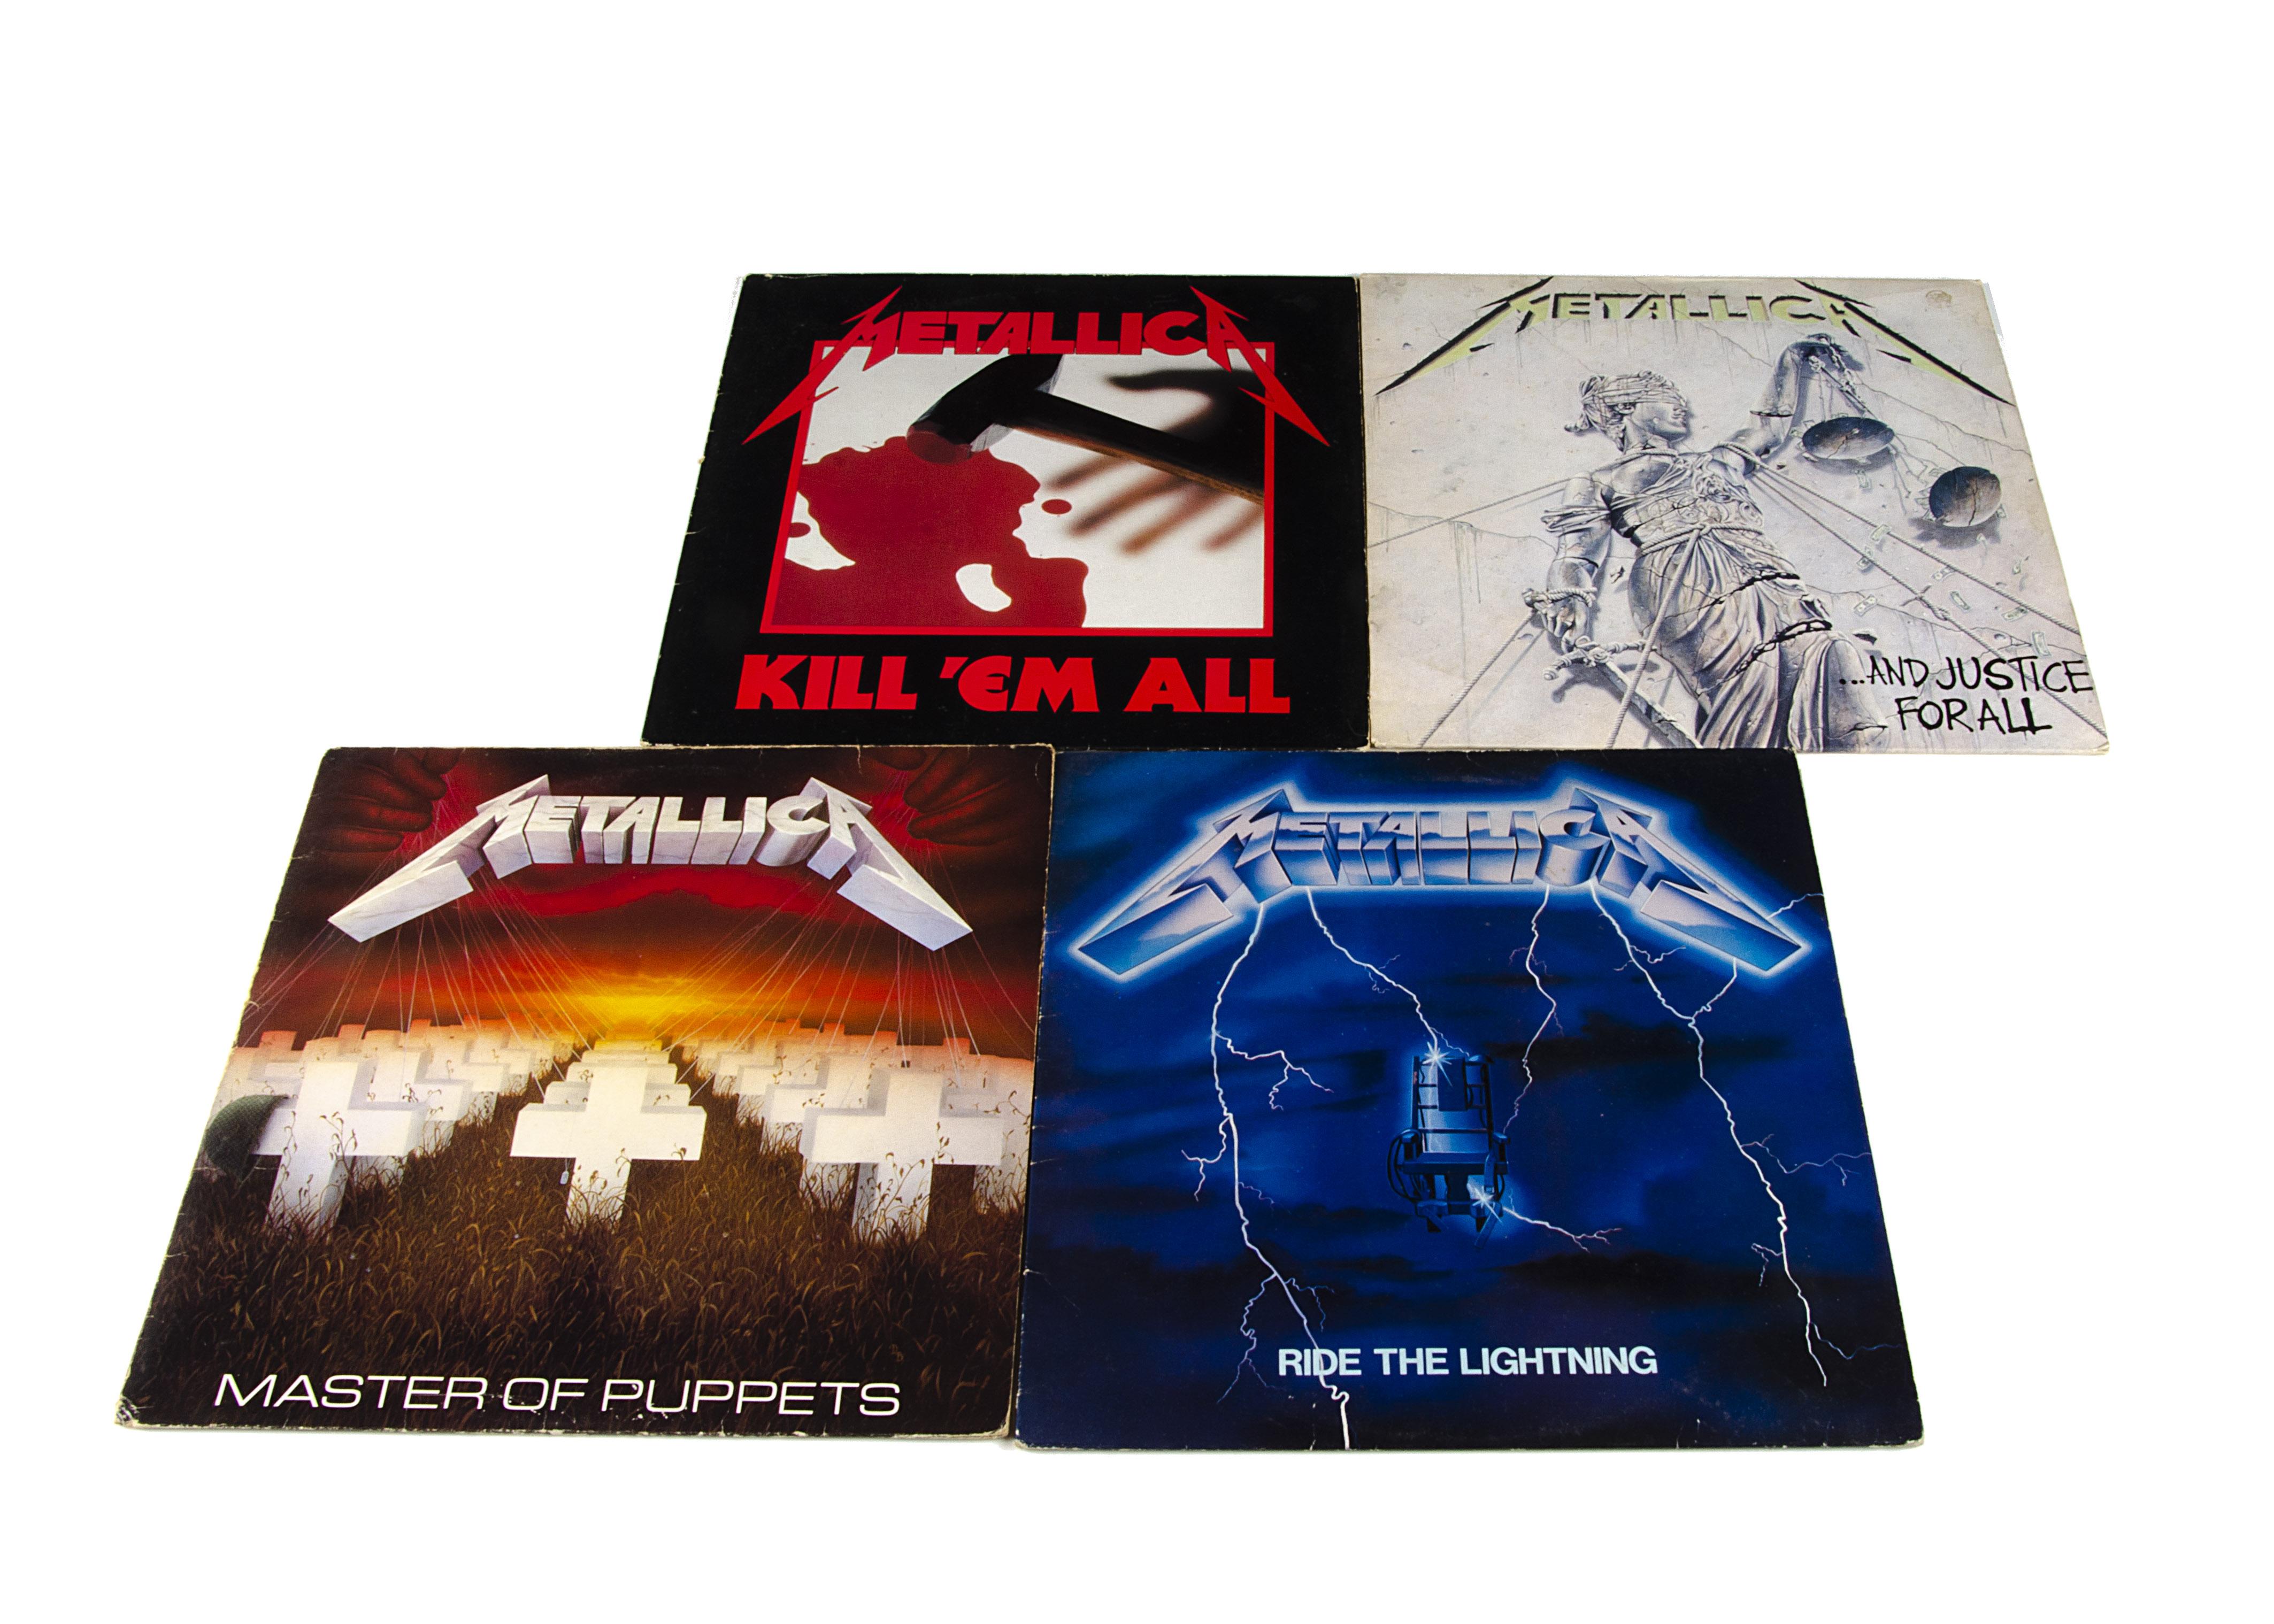 Metallica LPs, four original UK albums comprising Ride The Lightning (with inner VG/VG+), Master